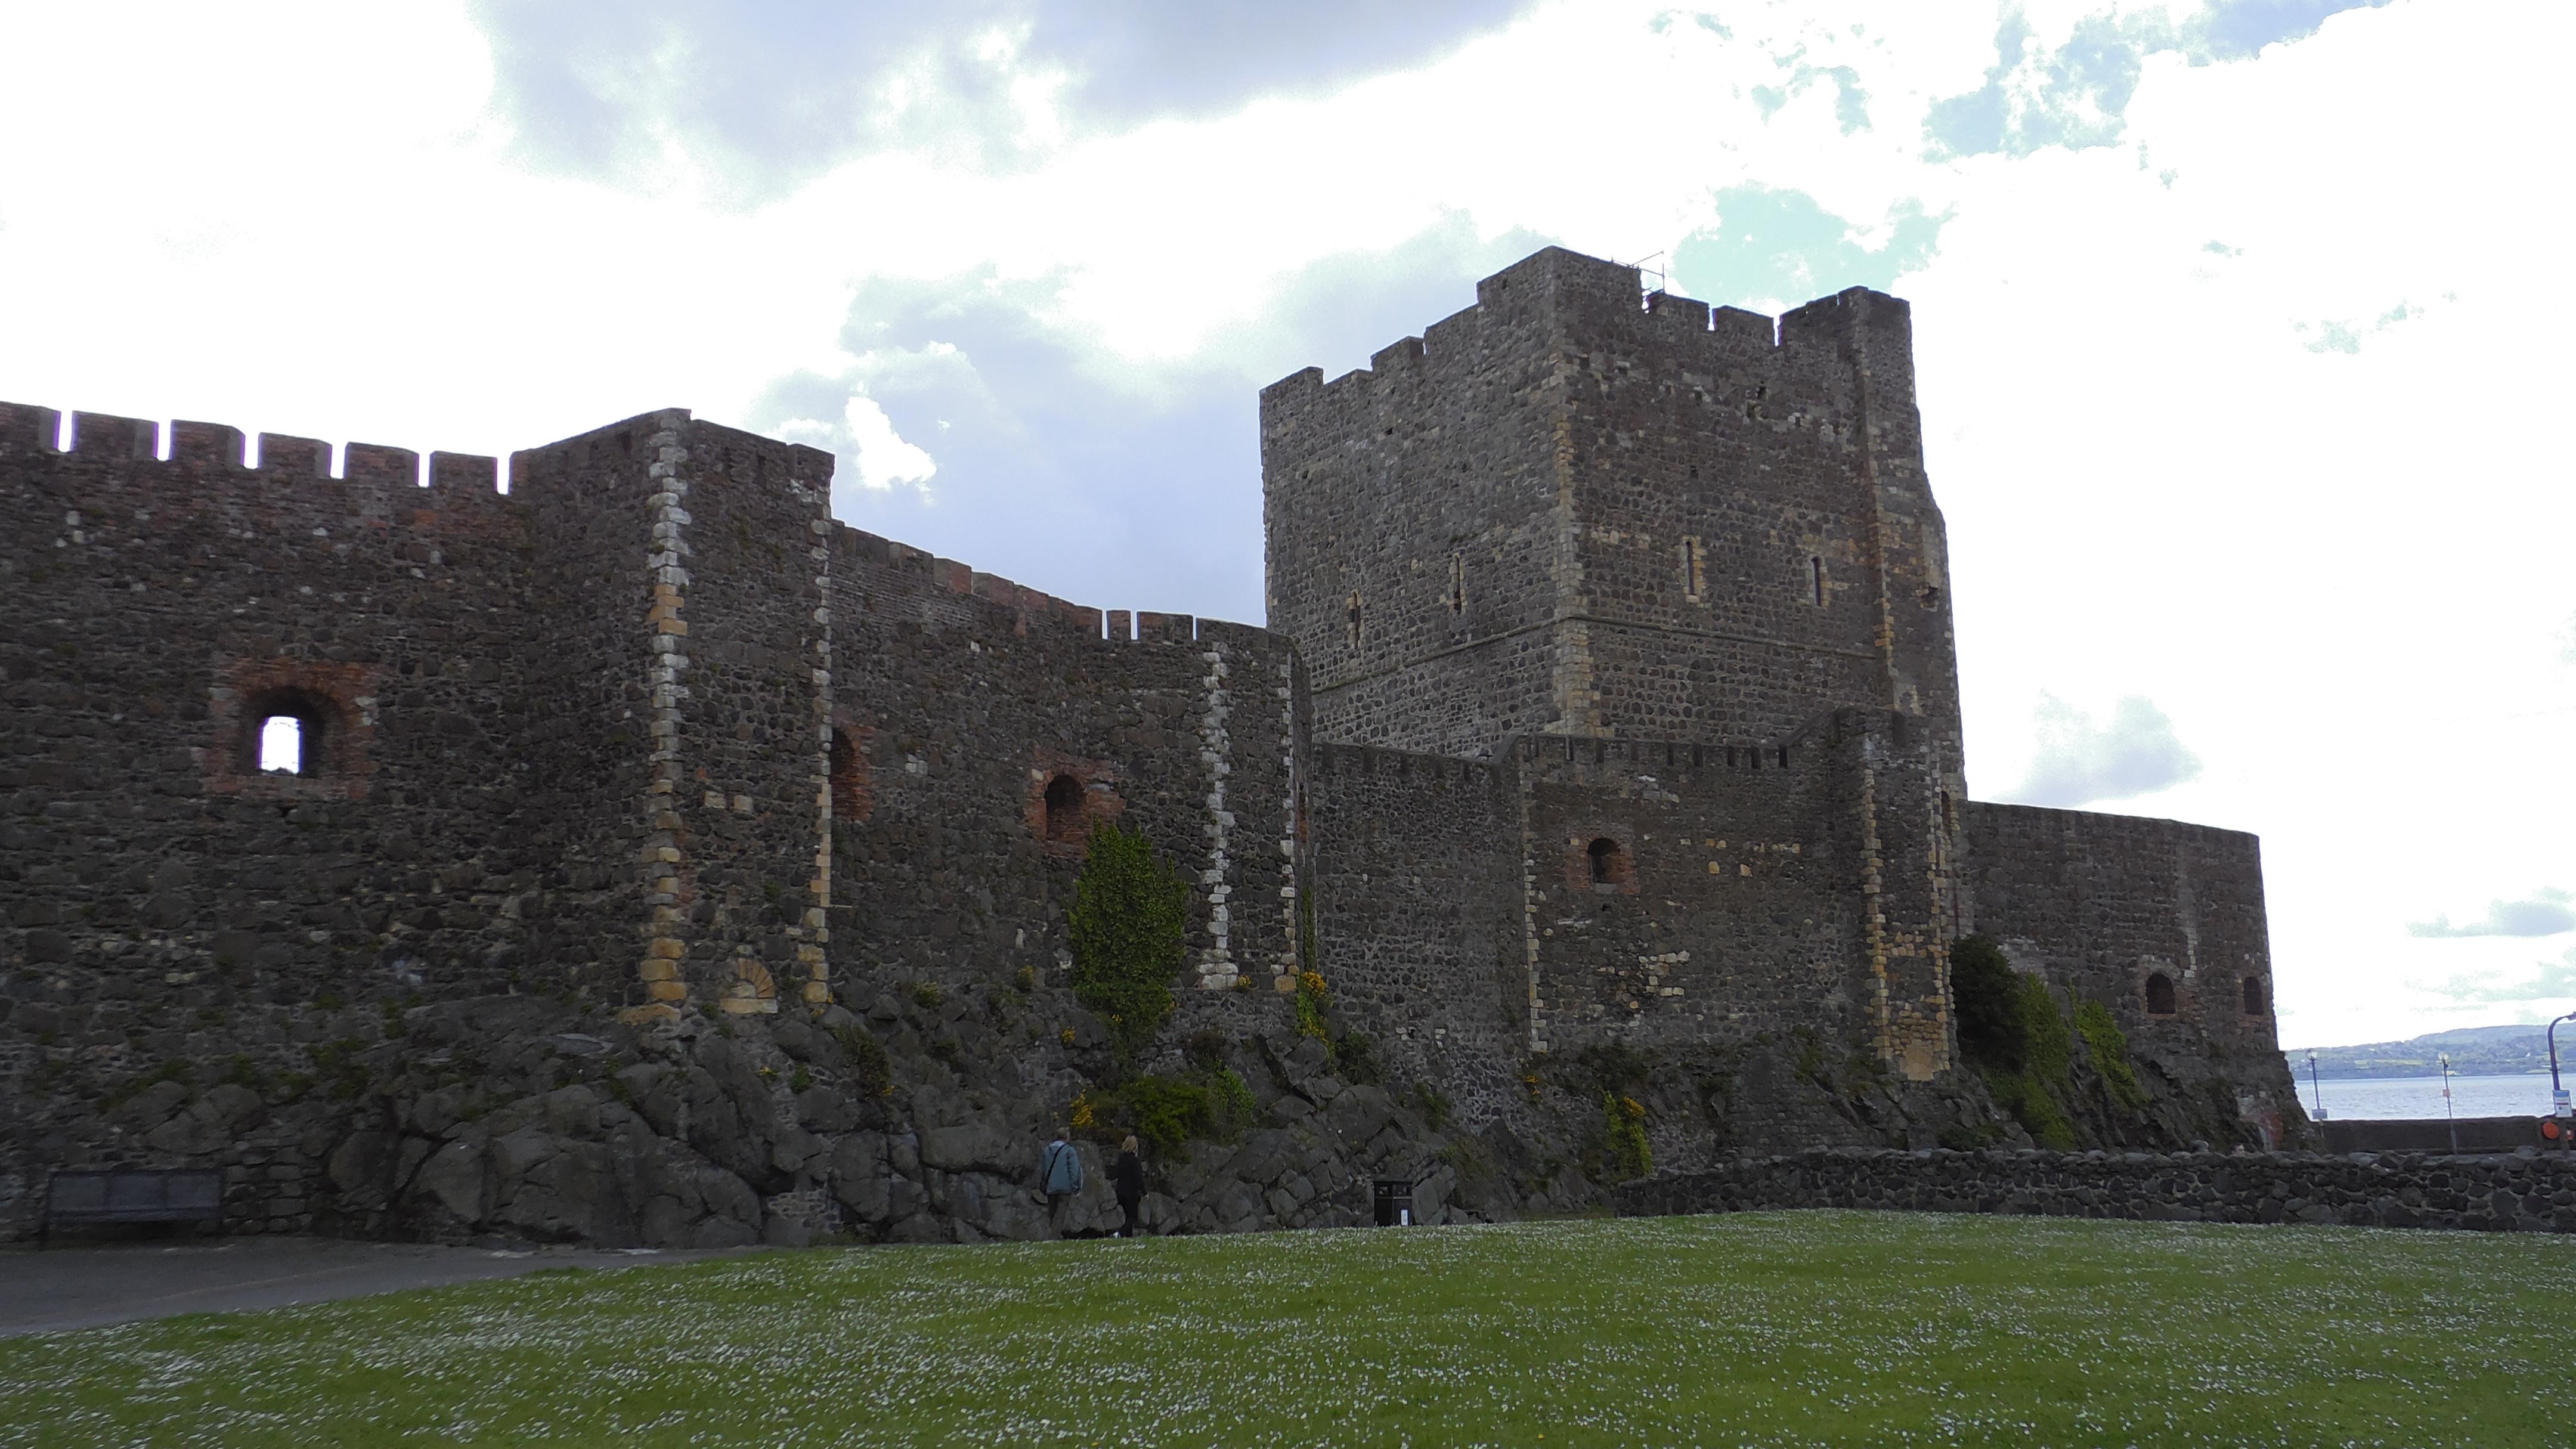 Castle Carrickfergus